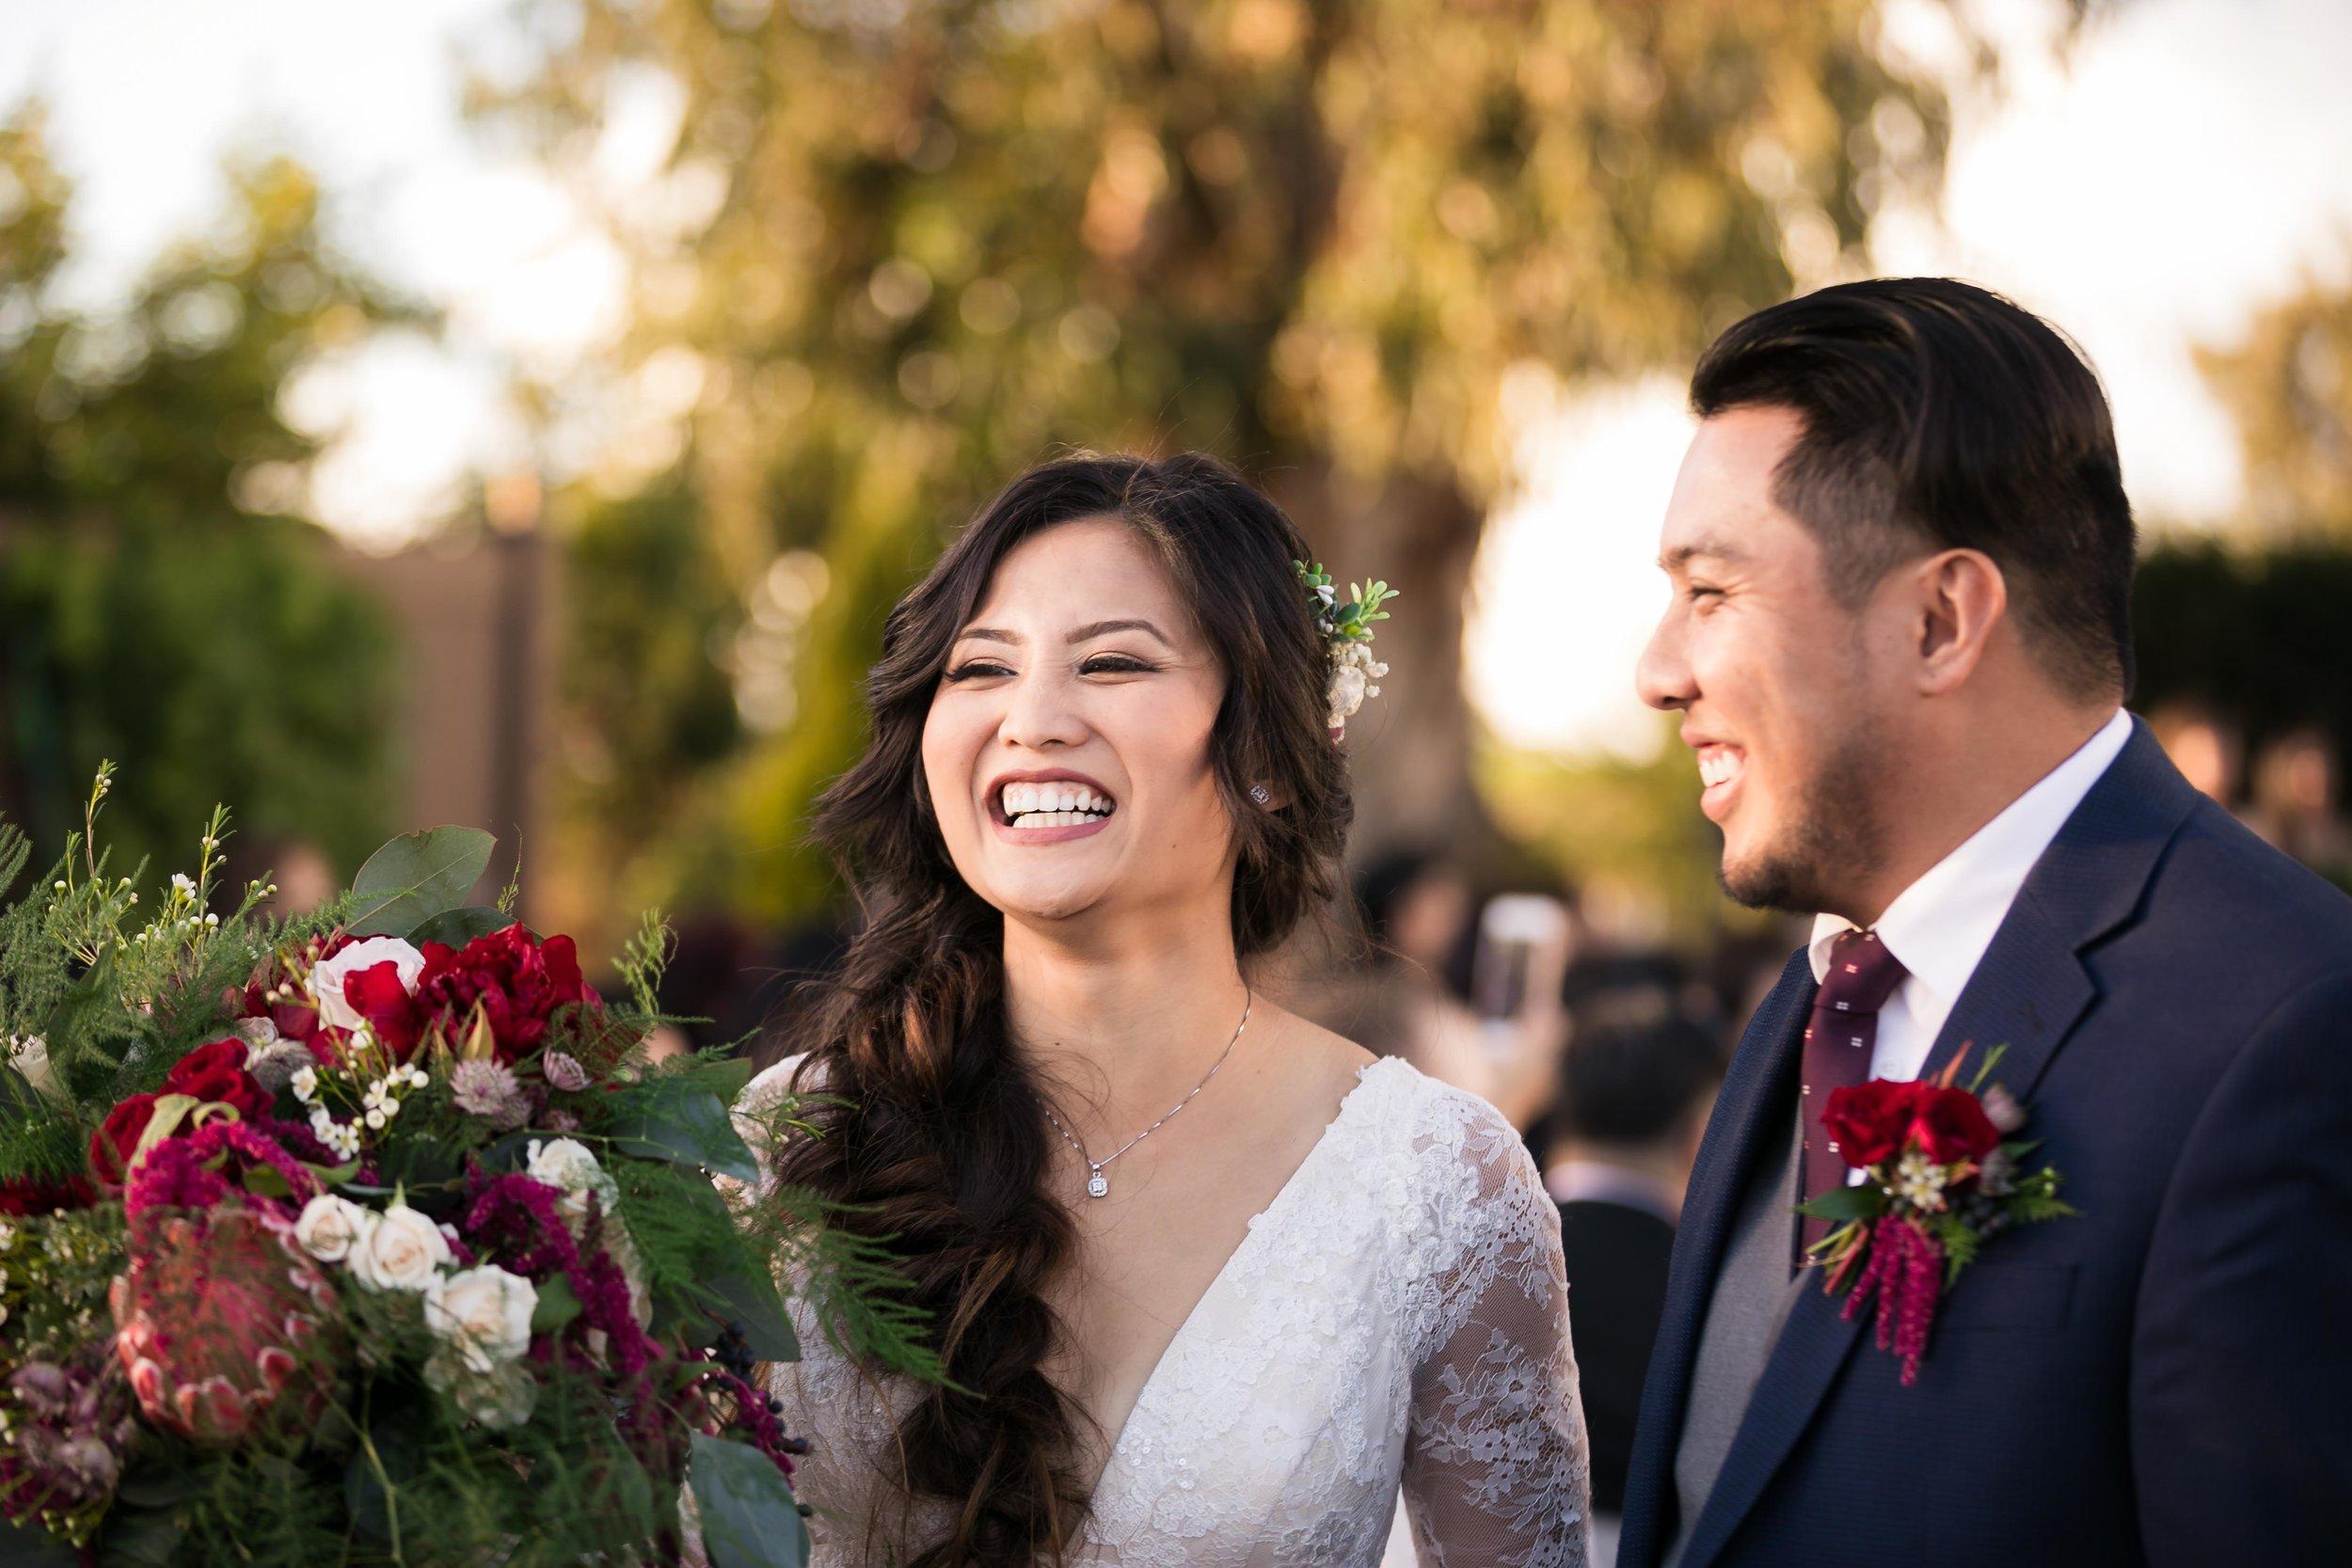 southern_california_wedding_joshuachun_photography-8.JPG